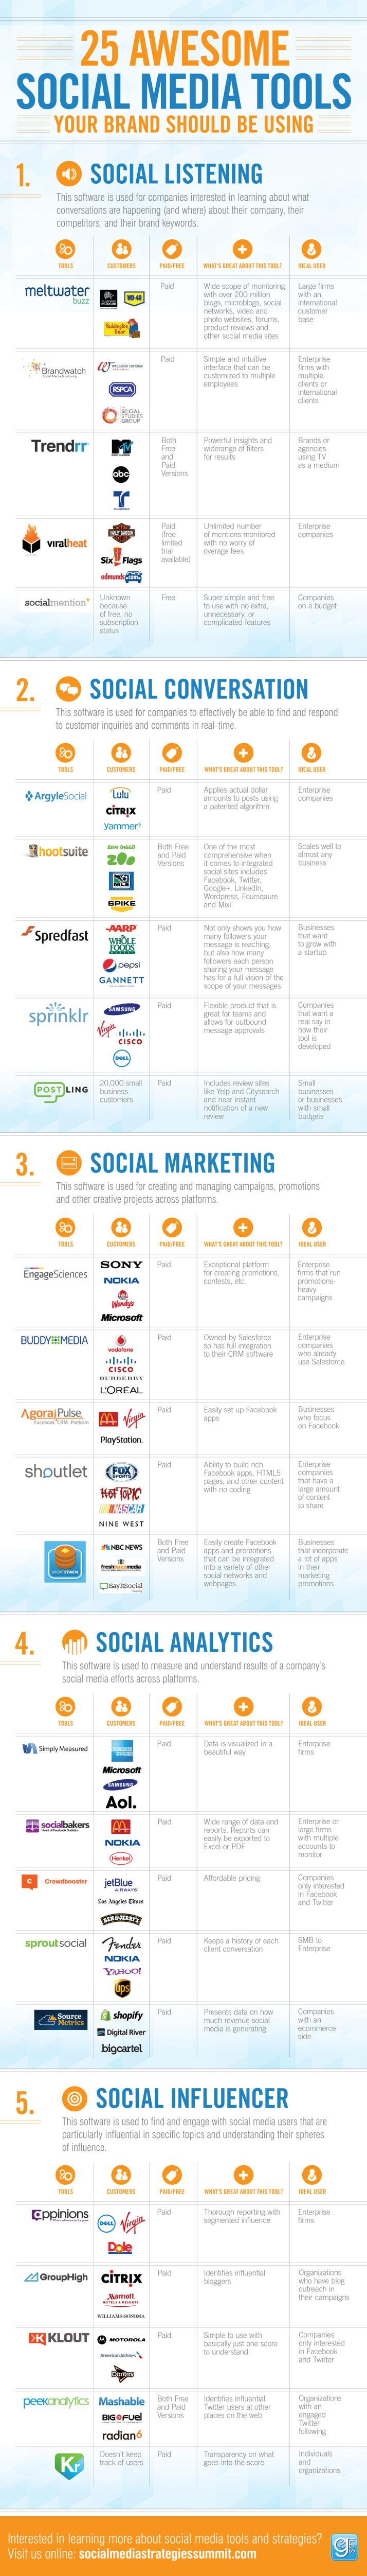 25 Awesome Social Media tools your brand should be using #infografia #infographic #socialmedia